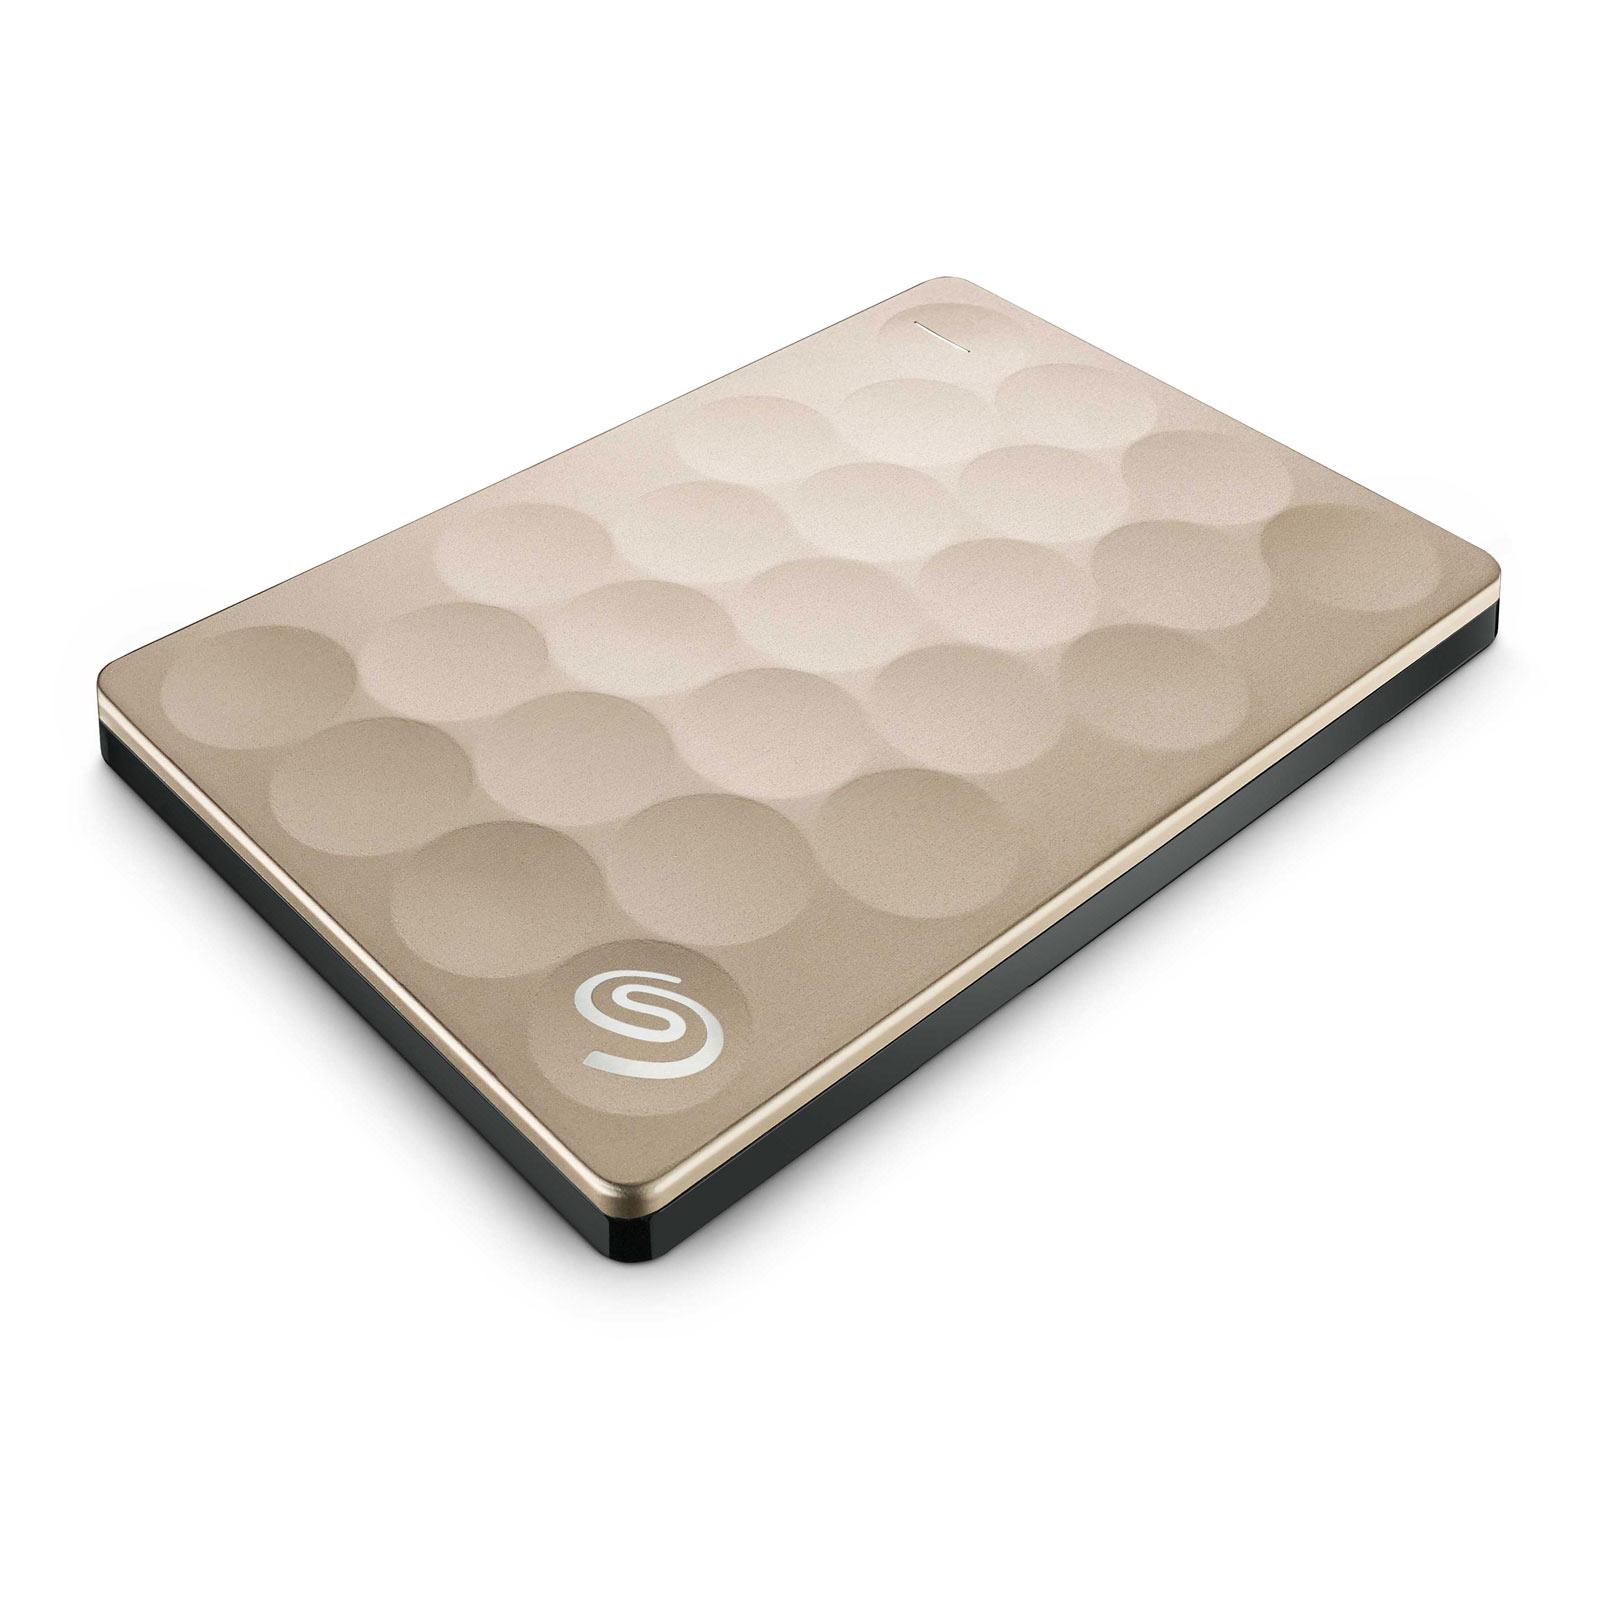 seagate backup plus ultra slim 2 to or usb 3 0 disque dur externe seagate technology sur. Black Bedroom Furniture Sets. Home Design Ideas